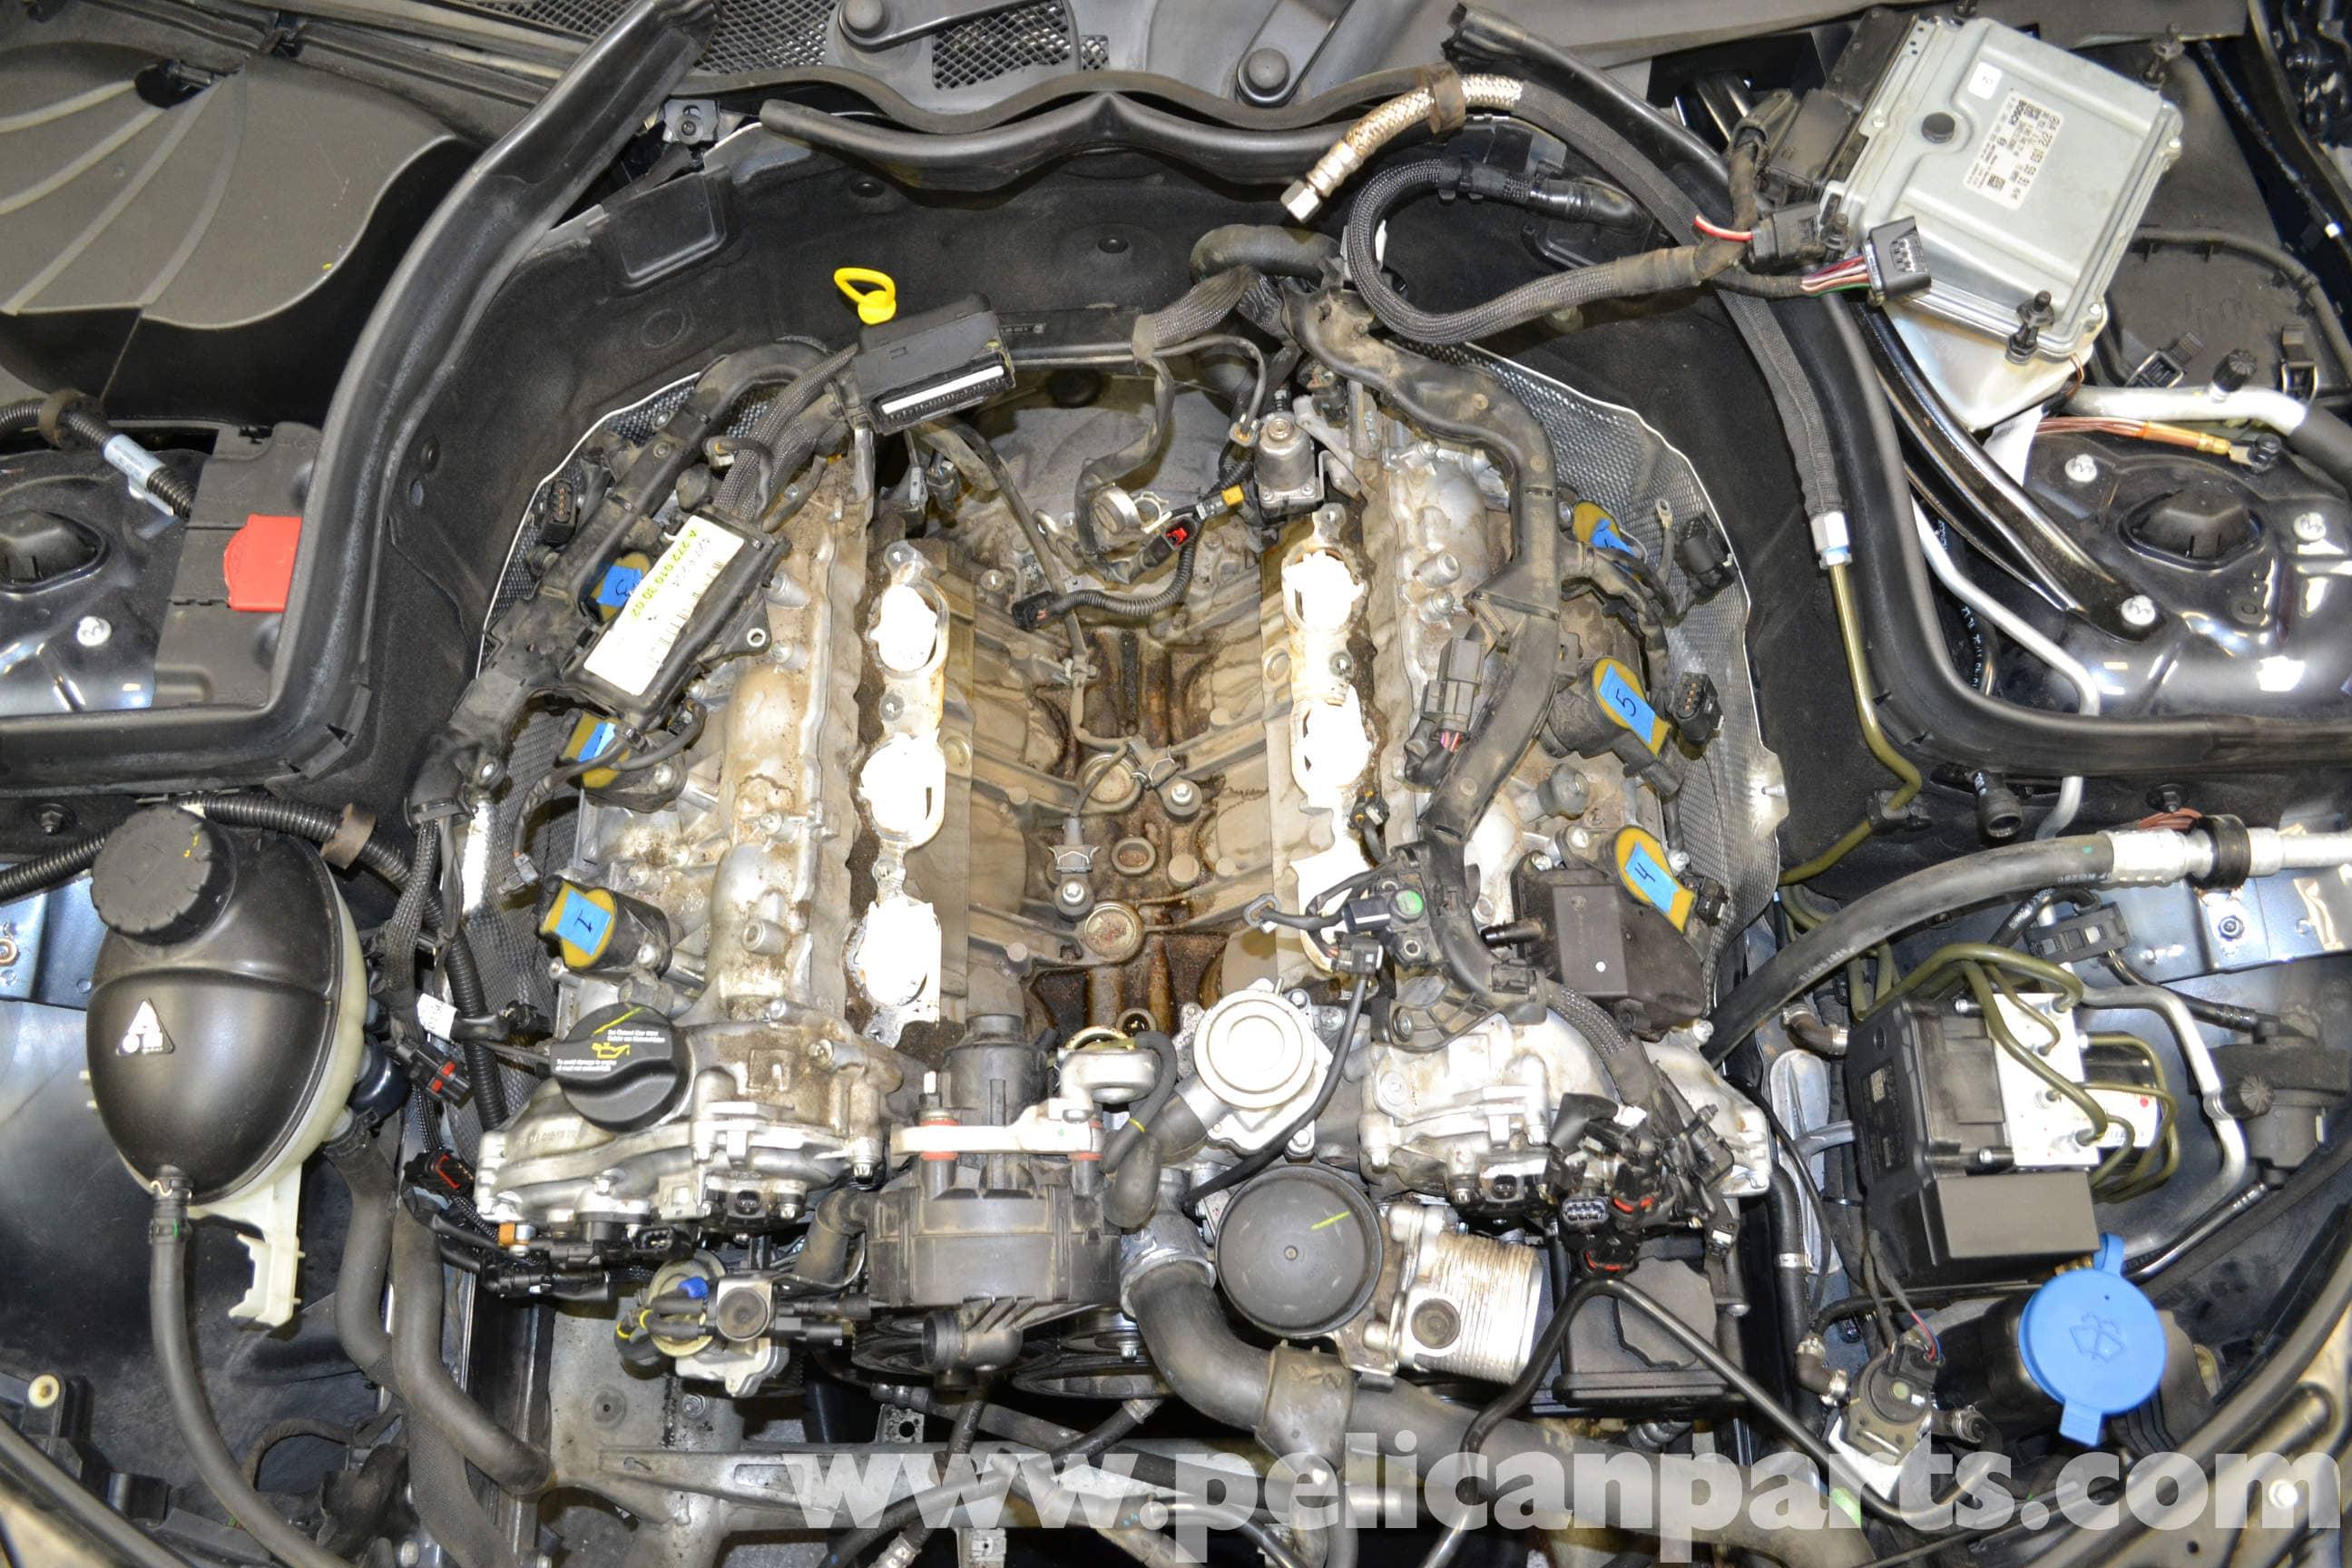 2008 E350 Wiring Diagram Mercedes Benz W204 Knock Sensors Replacement 2008 2014